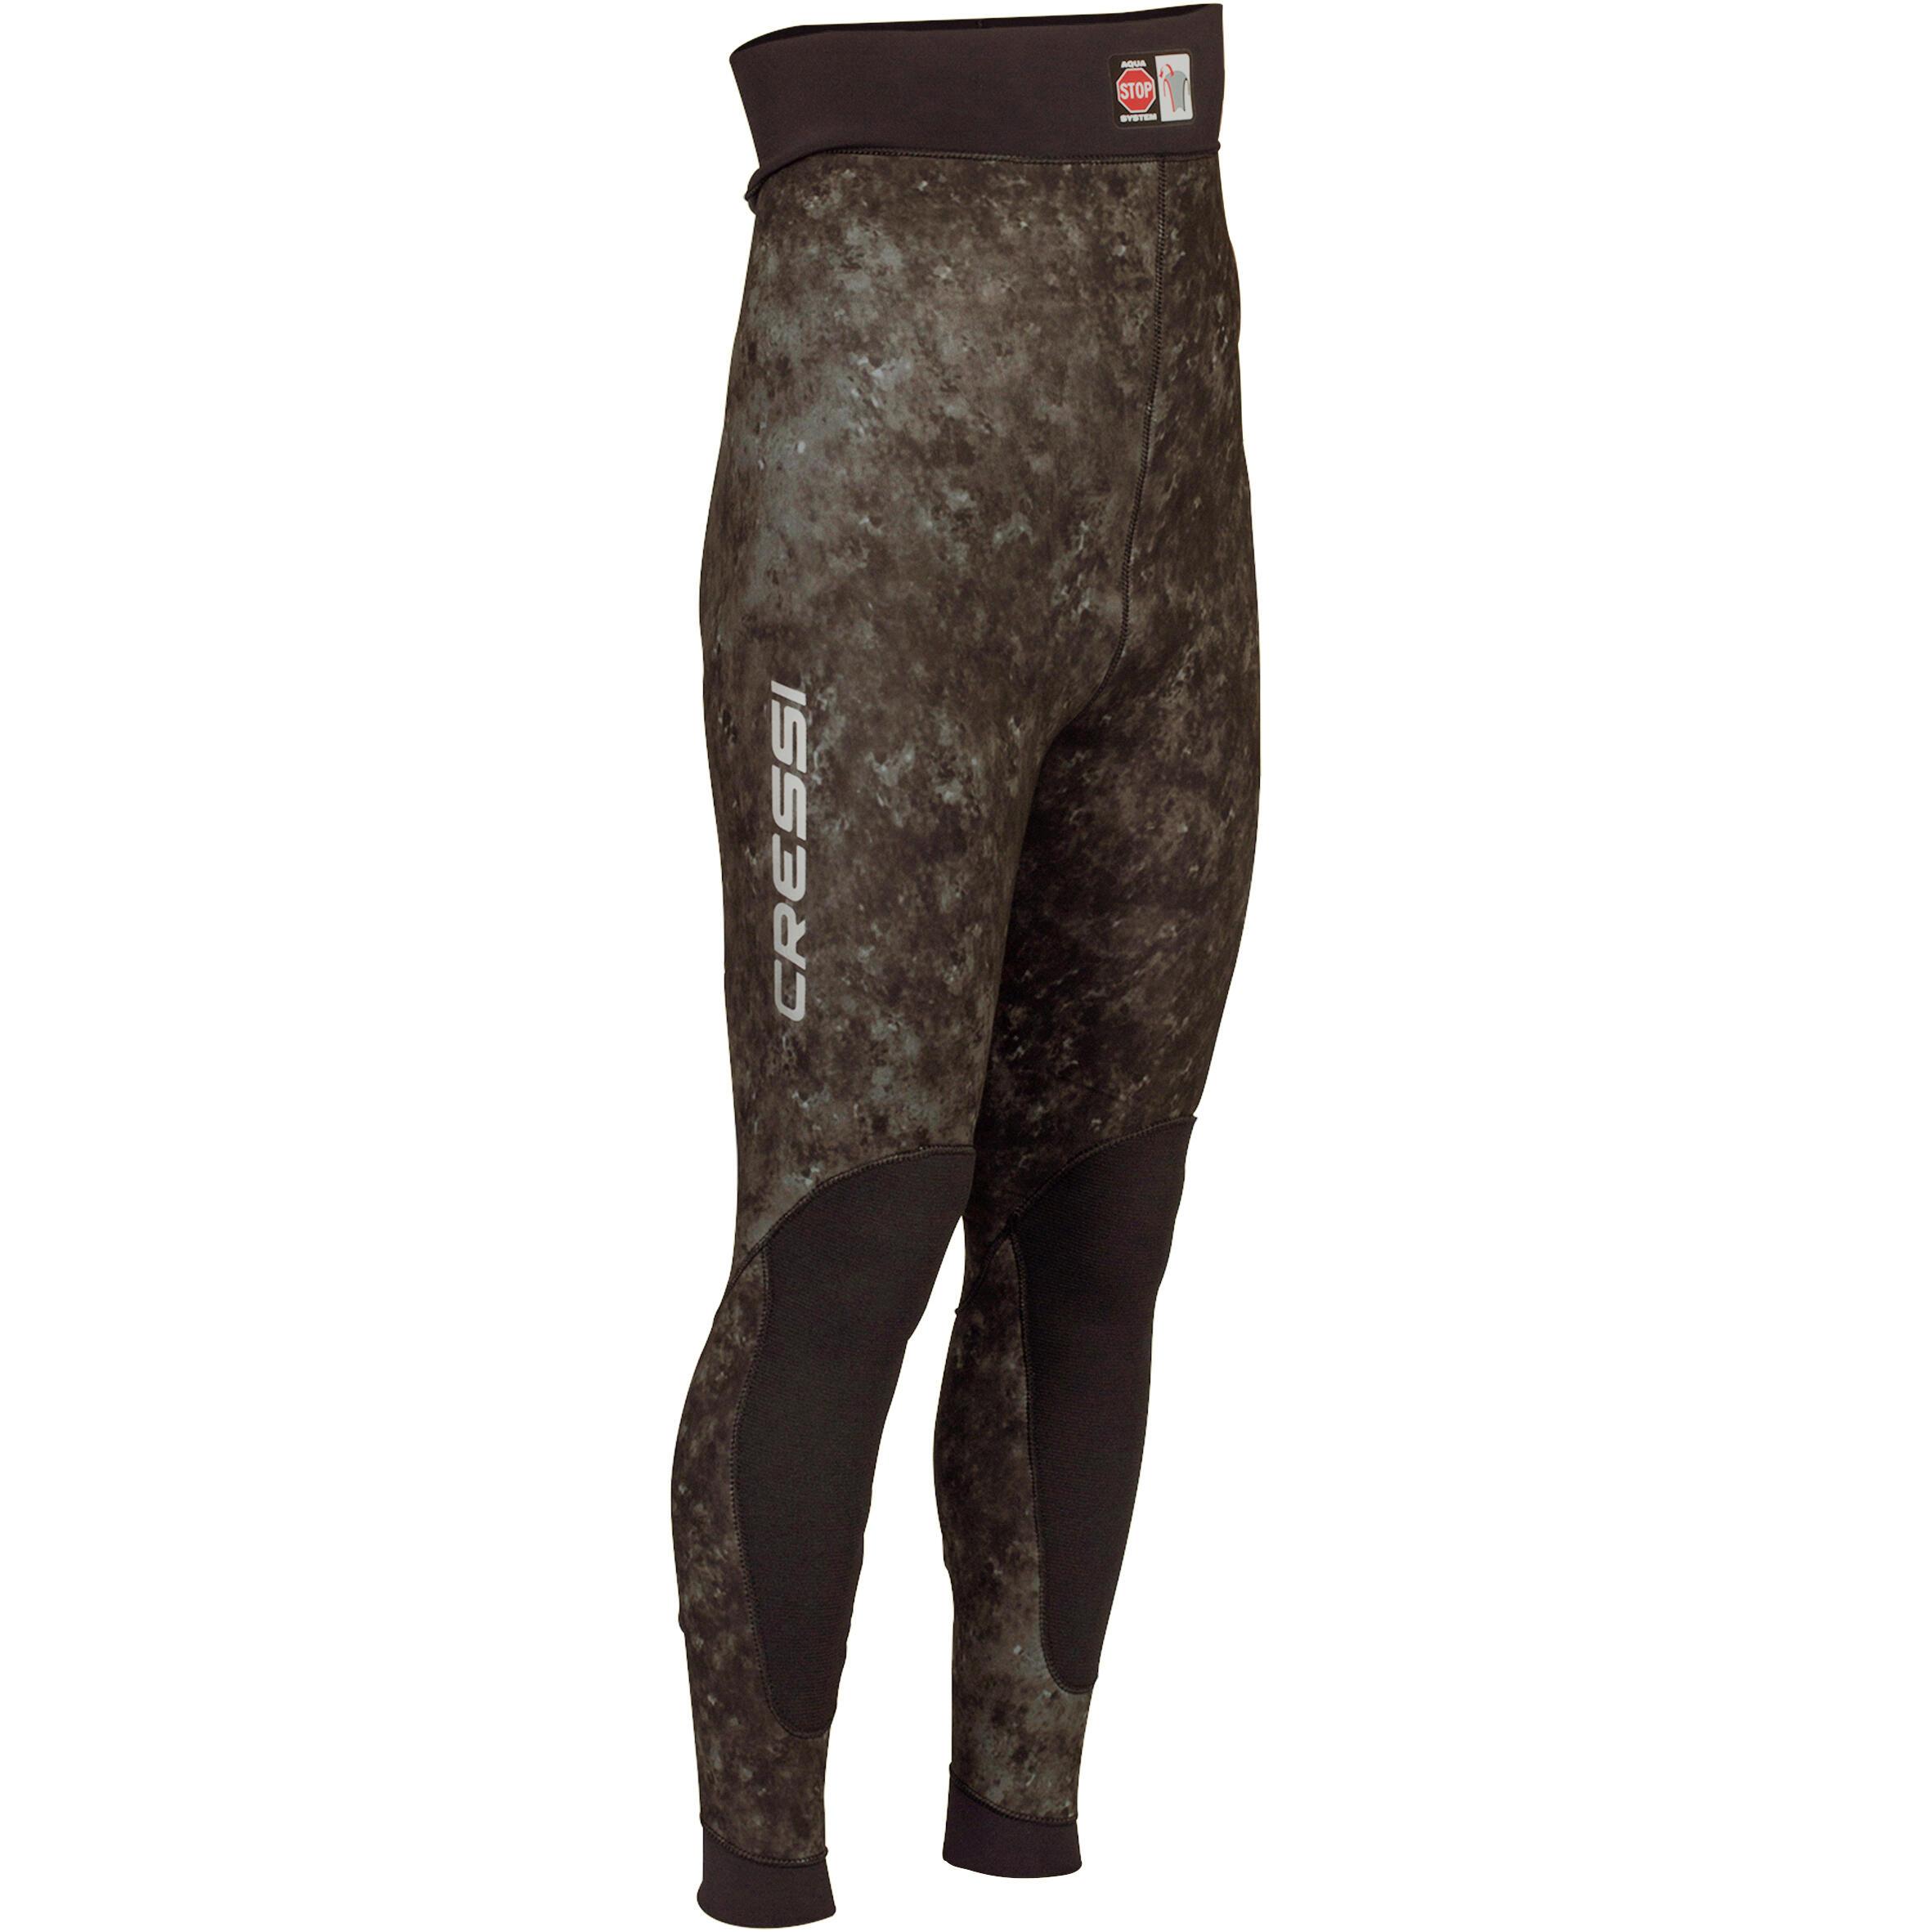 Neoprenhose Tauchen Tracina 3|5 mm Camouflage | Bekleidung > Bademode > Badeshorts | No brand